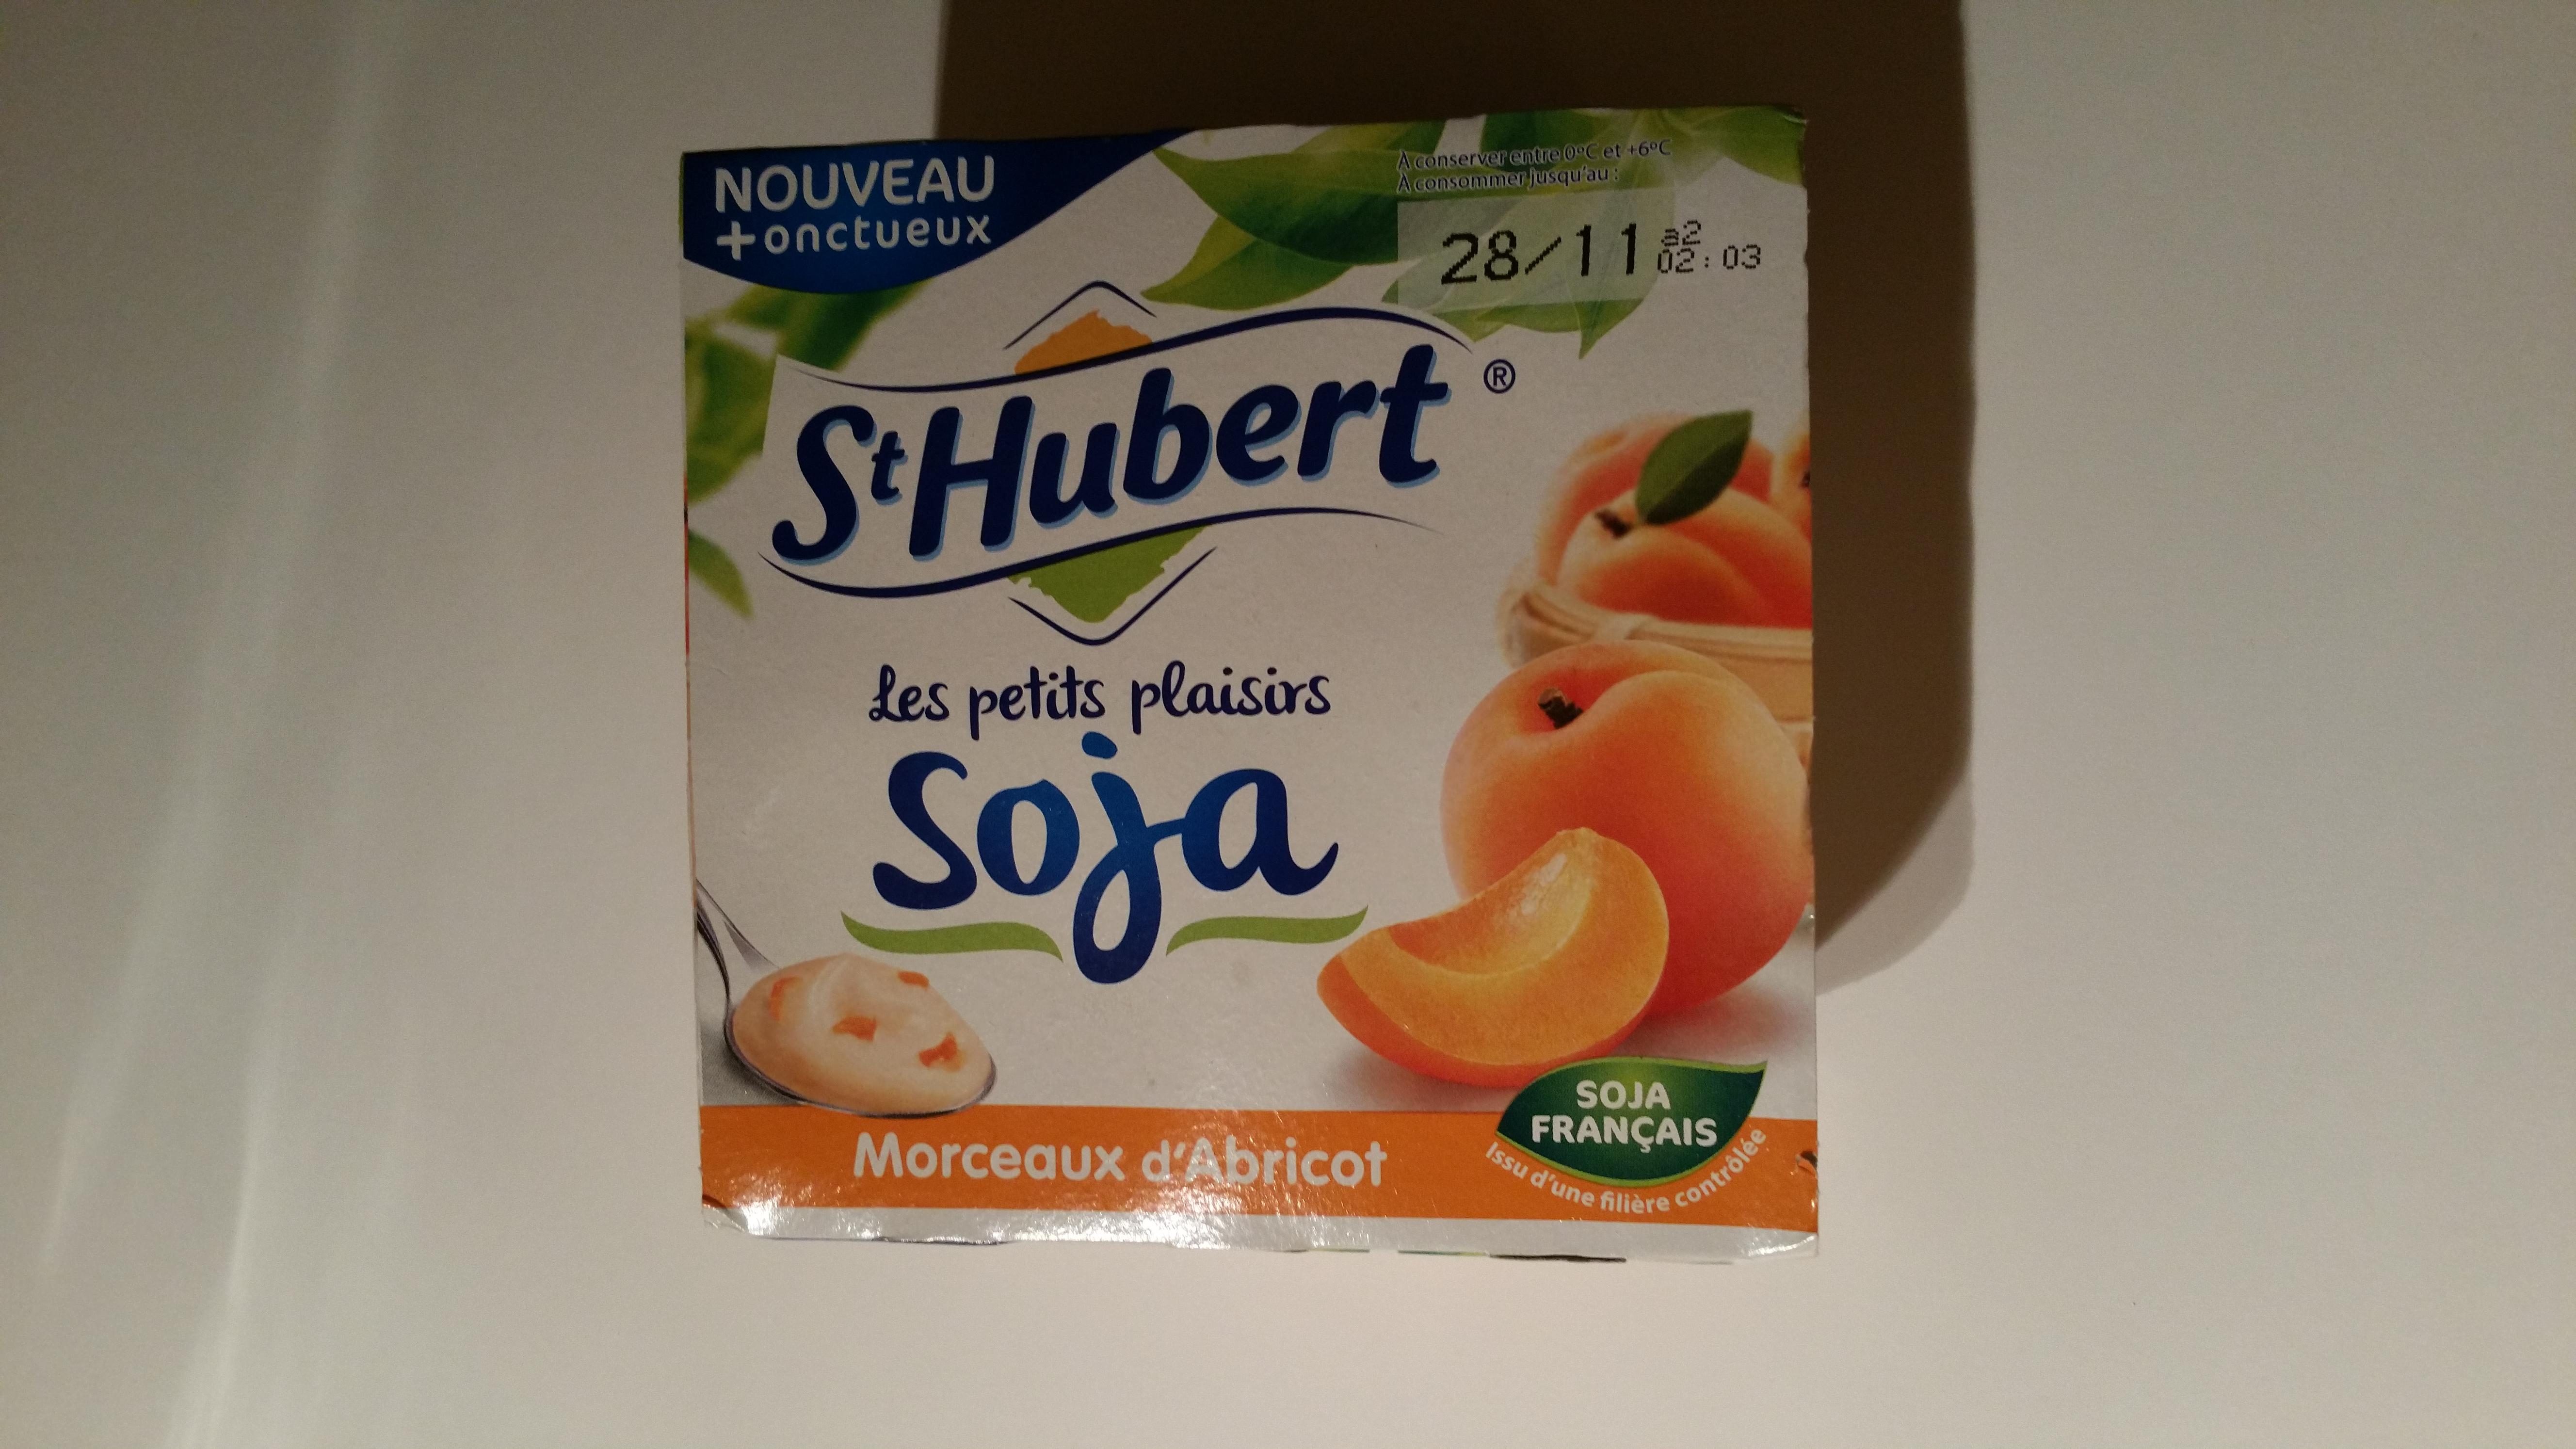 St-Hubert-Petits-Plaisirs-Soja®-Abricot - St-Hubert-Les-Petits-Plaisirs-Soja®-Abricot-5.jpg